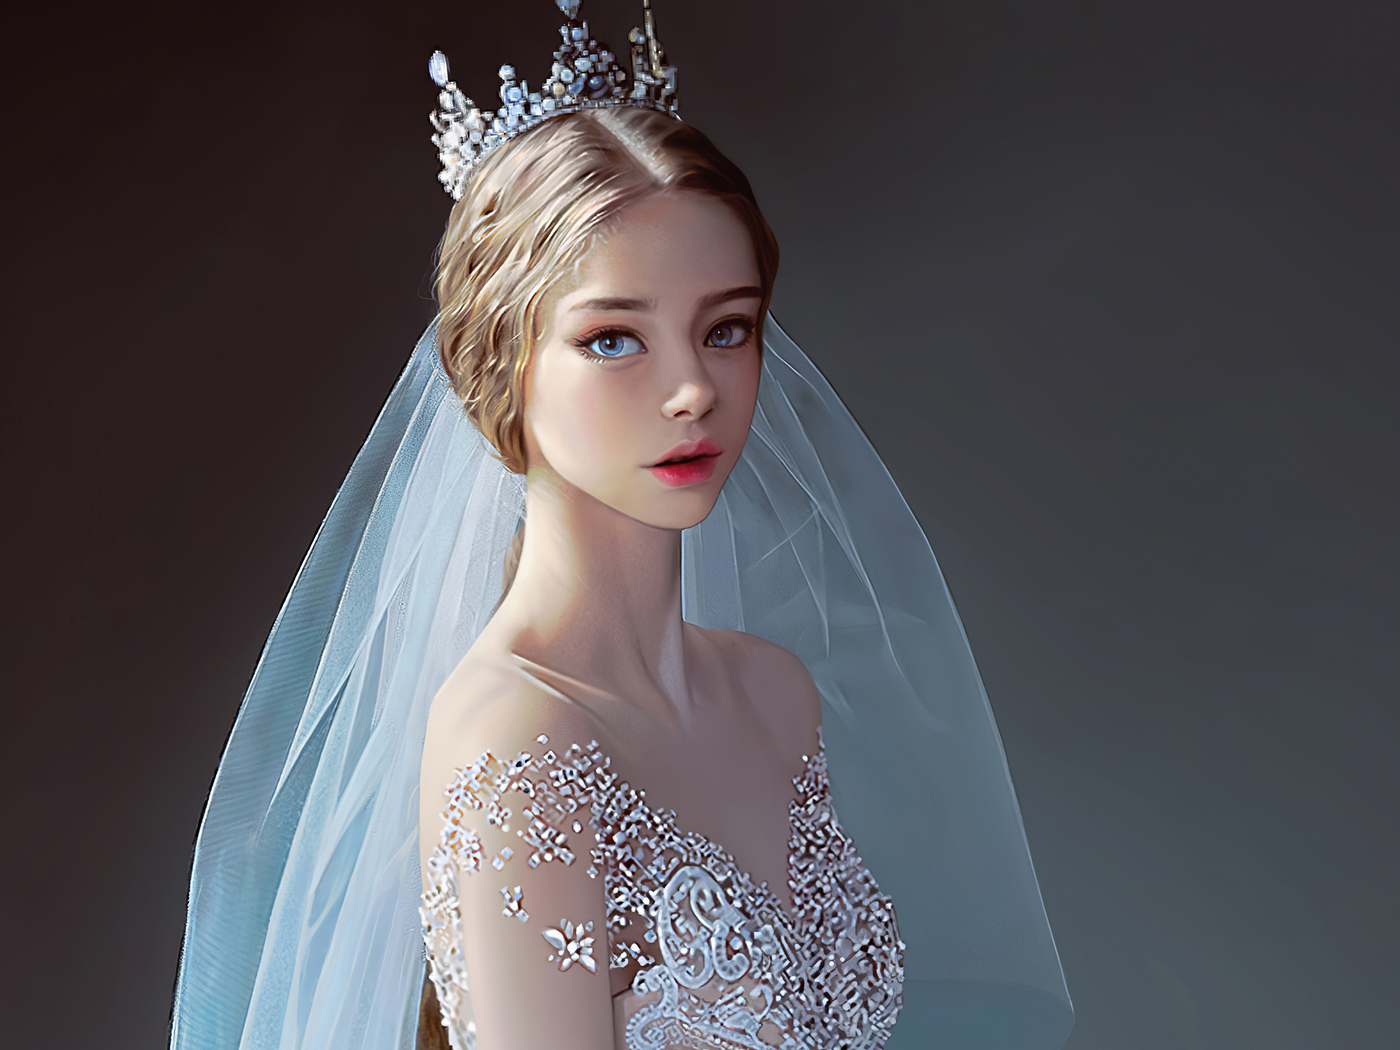 bride-dressing-gown-digital-art-gl.jpg